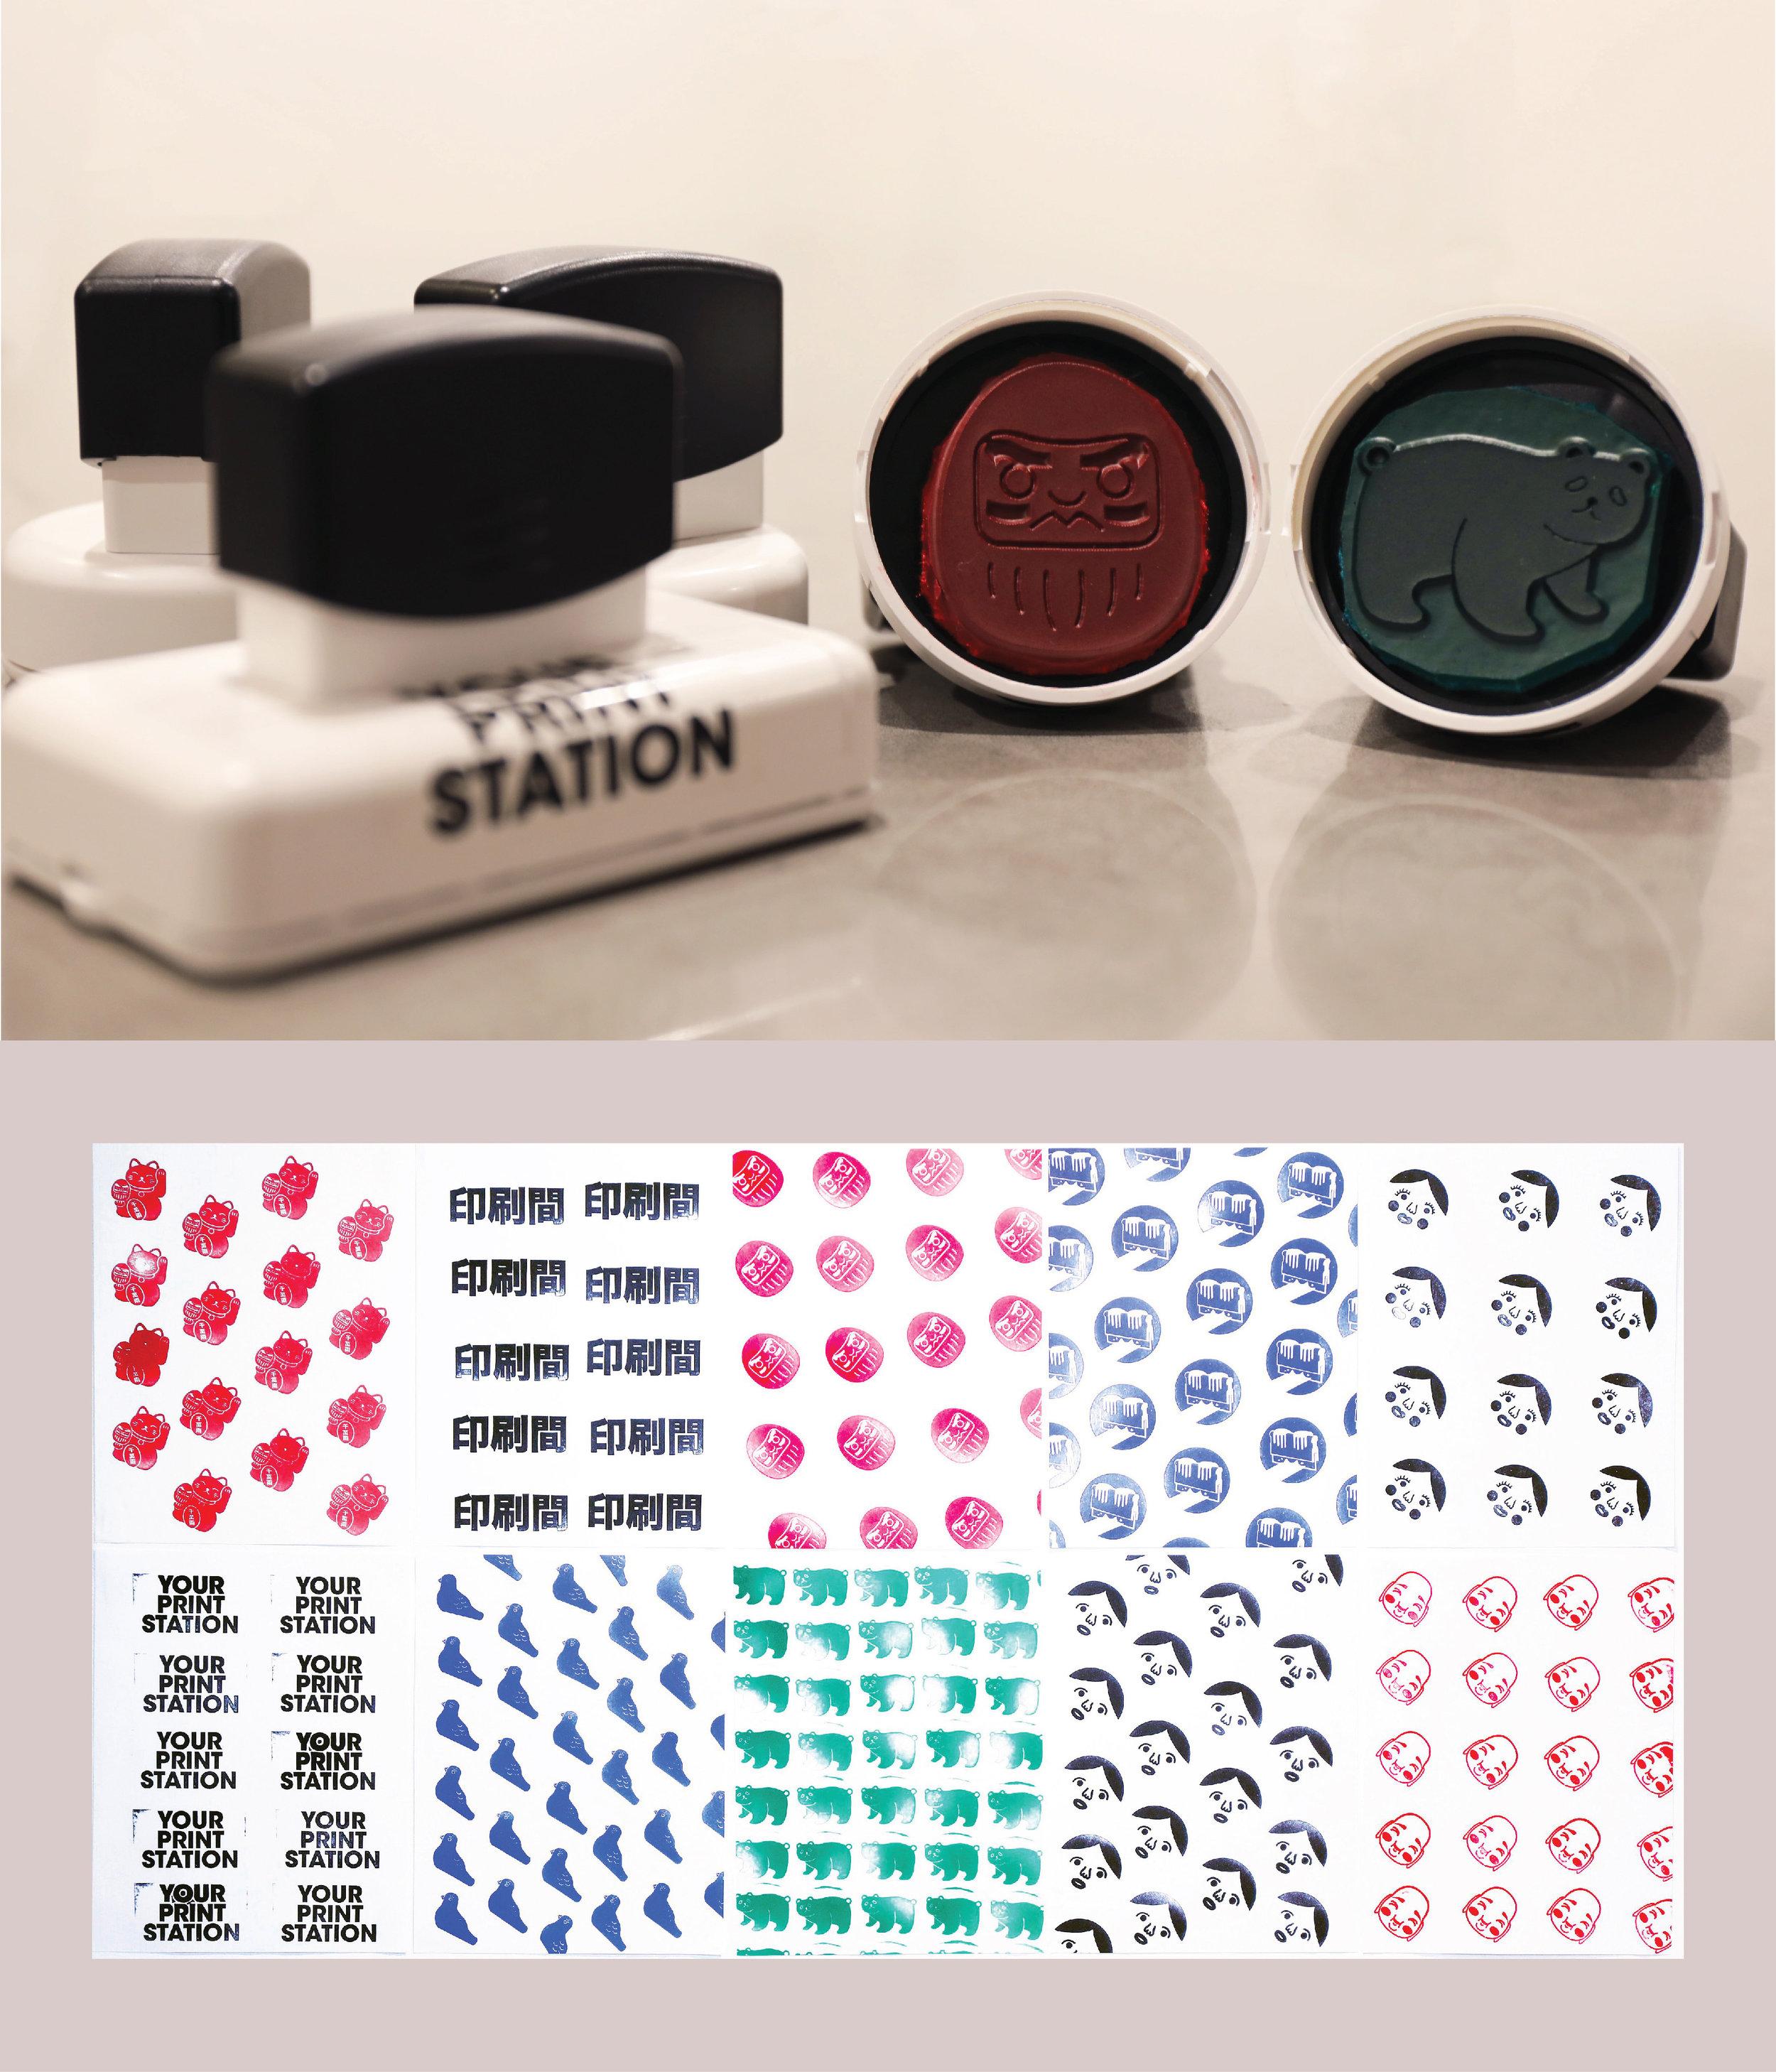 17-Your Print Station.jpg